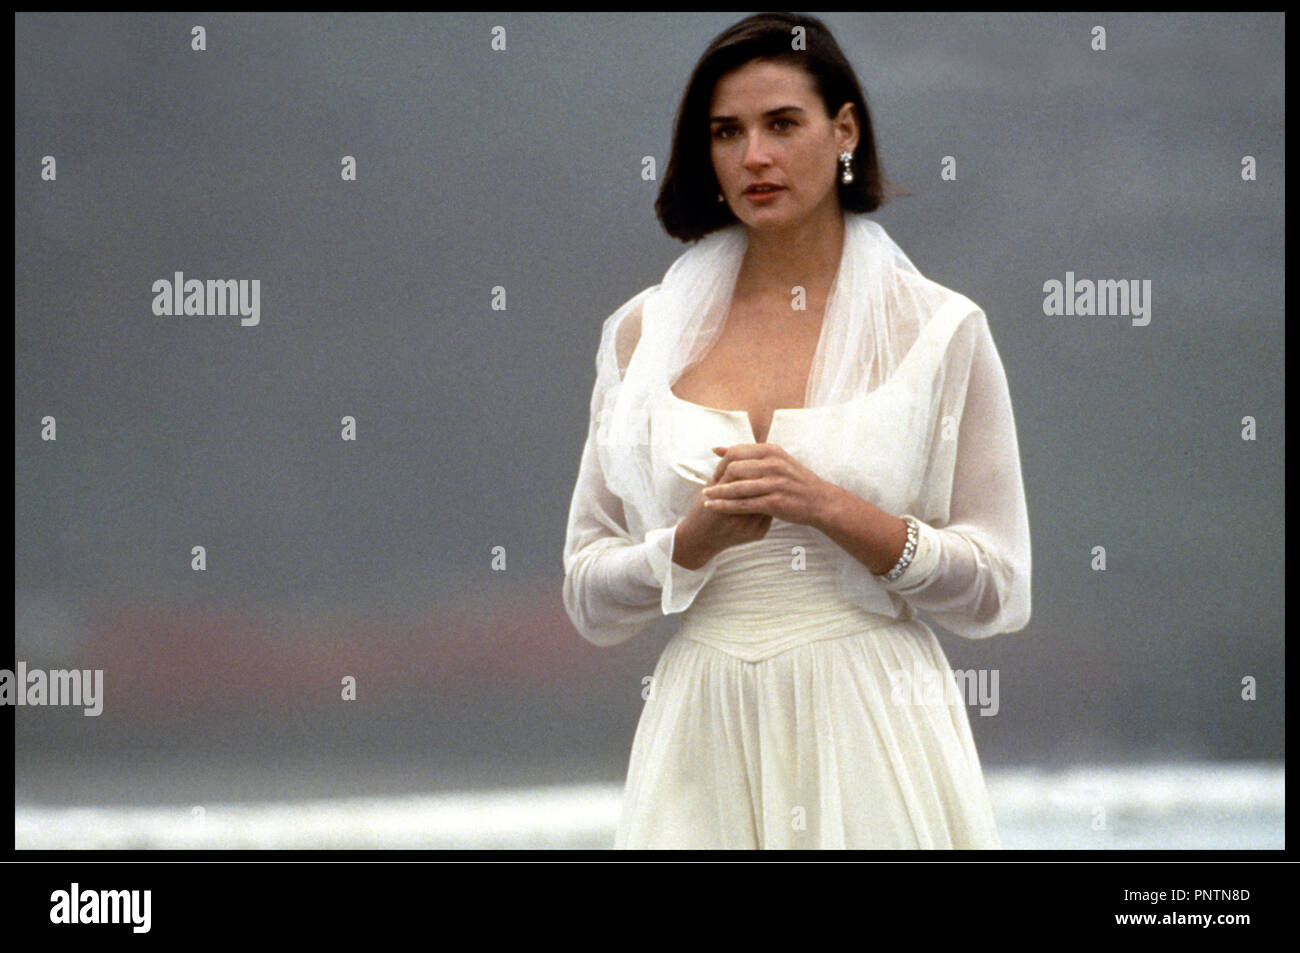 Prod DB ©ÊParamount / DR PROPOSITION INDECENTE (INDECENT PROPOSAL) de Adrian Lyne 1993 USA avec Demi Moore candeur, innocence, blanc - Stock Image